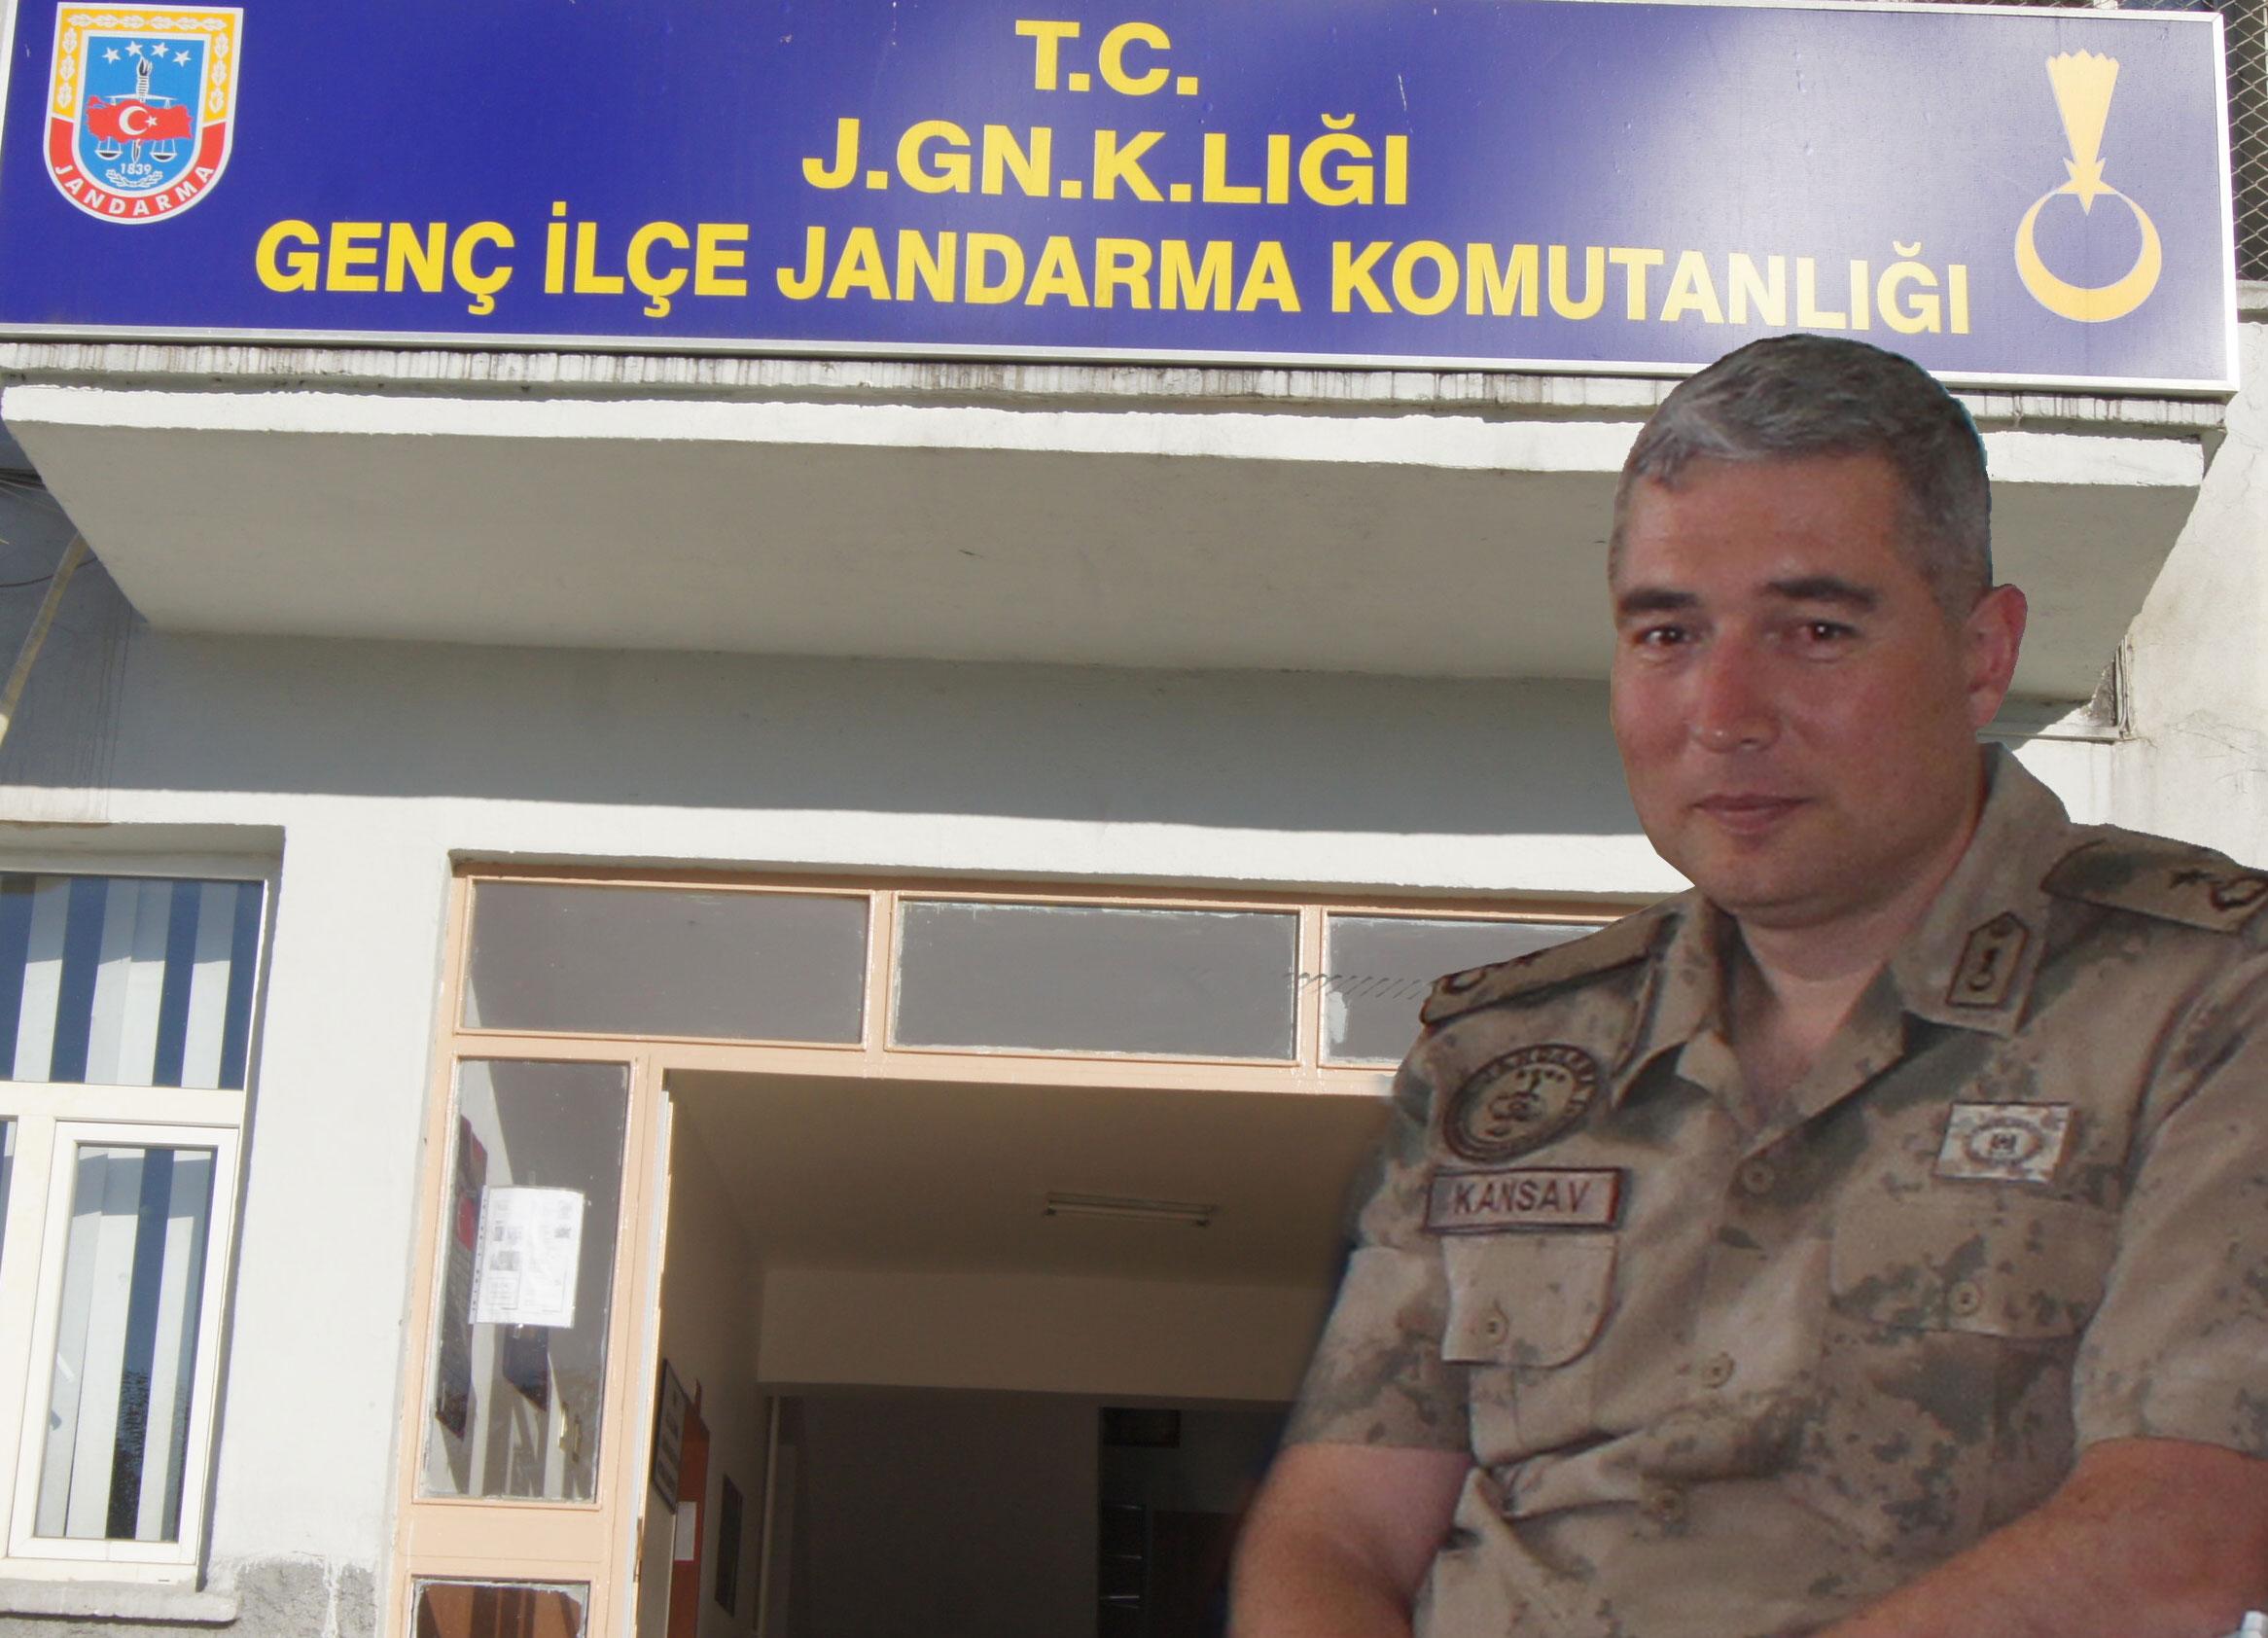 İlçe Jandarma Komutanlığı'na Kansav atandı